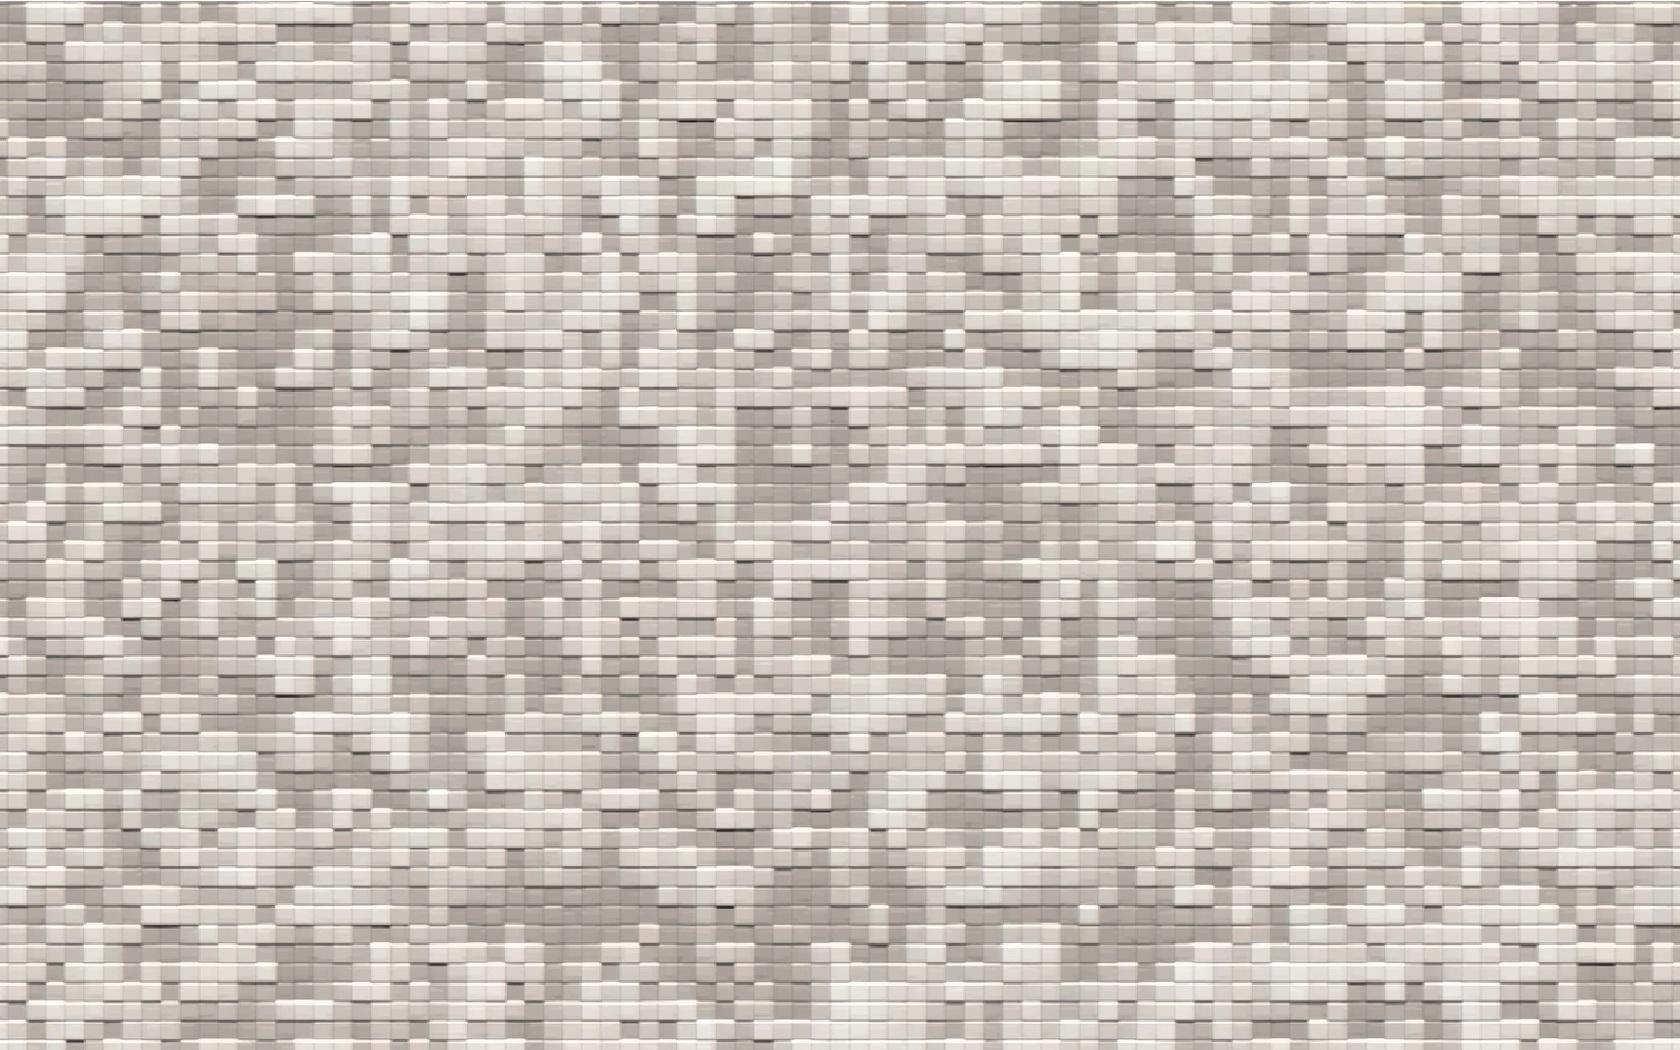 Wallpaper Pixel Black Digital Camouflage 1680x1050